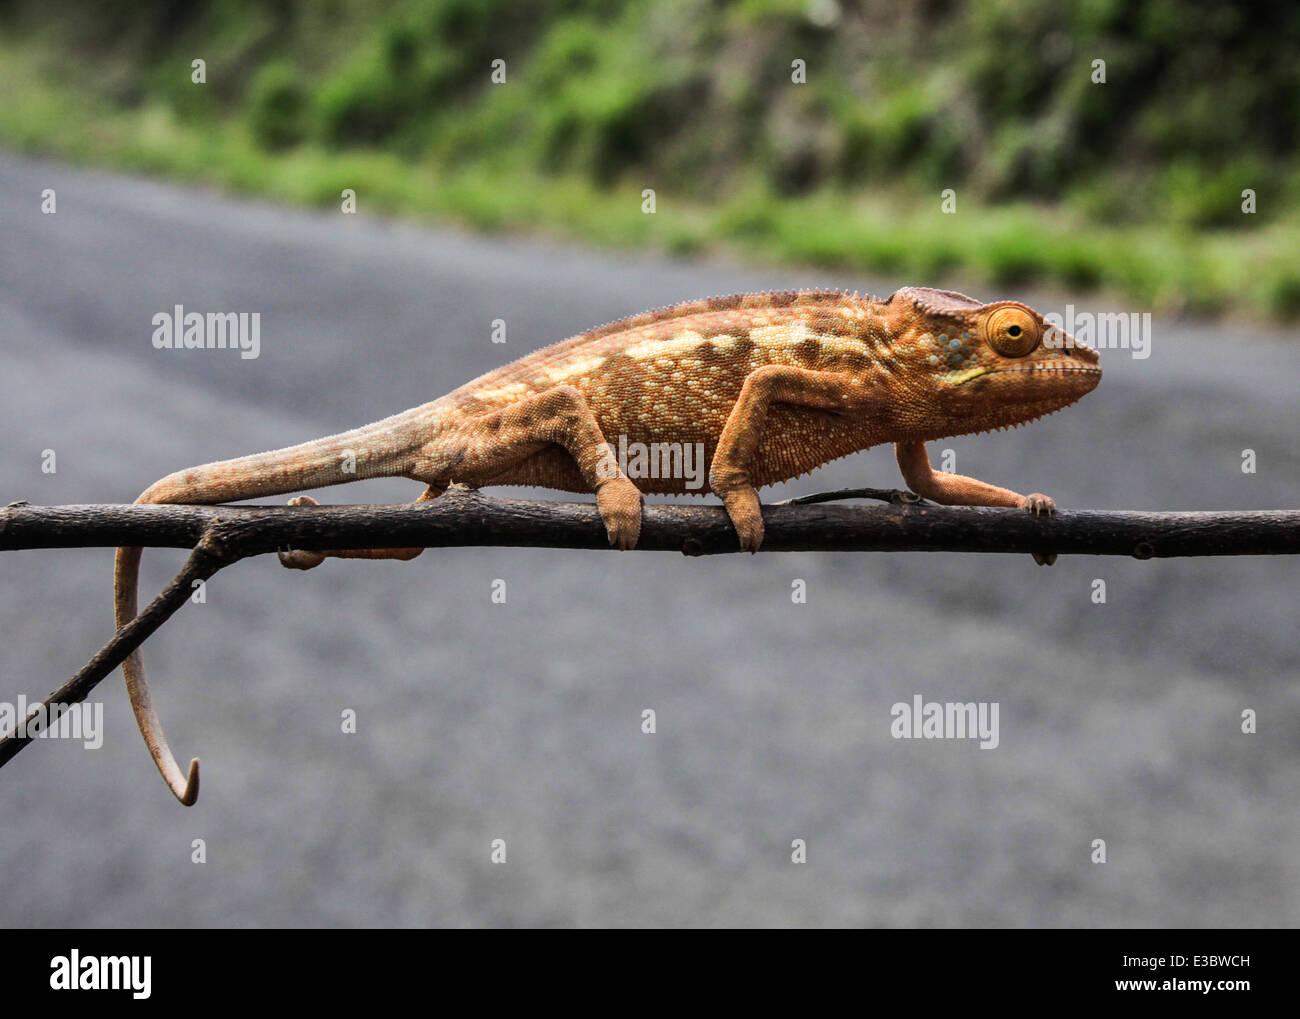 Afrika, Madagaskar, Pantherchamäleon (Furcifer Pardalis) Stockbild